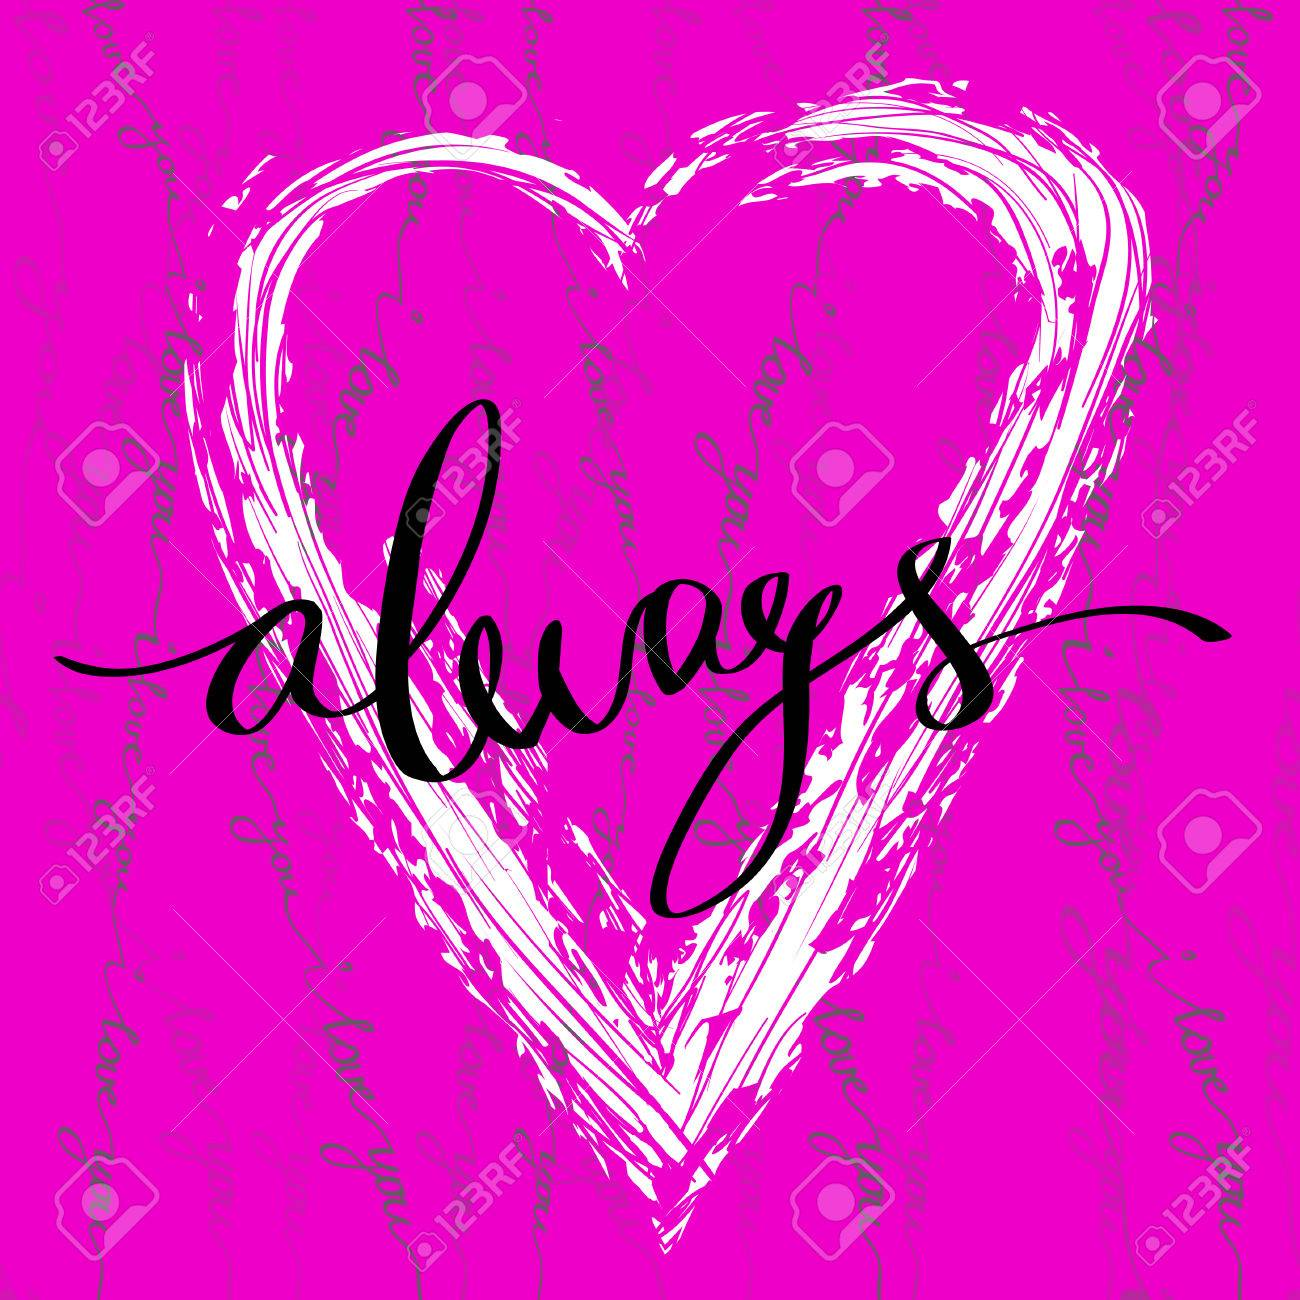 Hand drawn calligraphy valentine love card always lettering hand drawn calligraphy valentine love card always lettering love greetings poster and light background with m4hsunfo